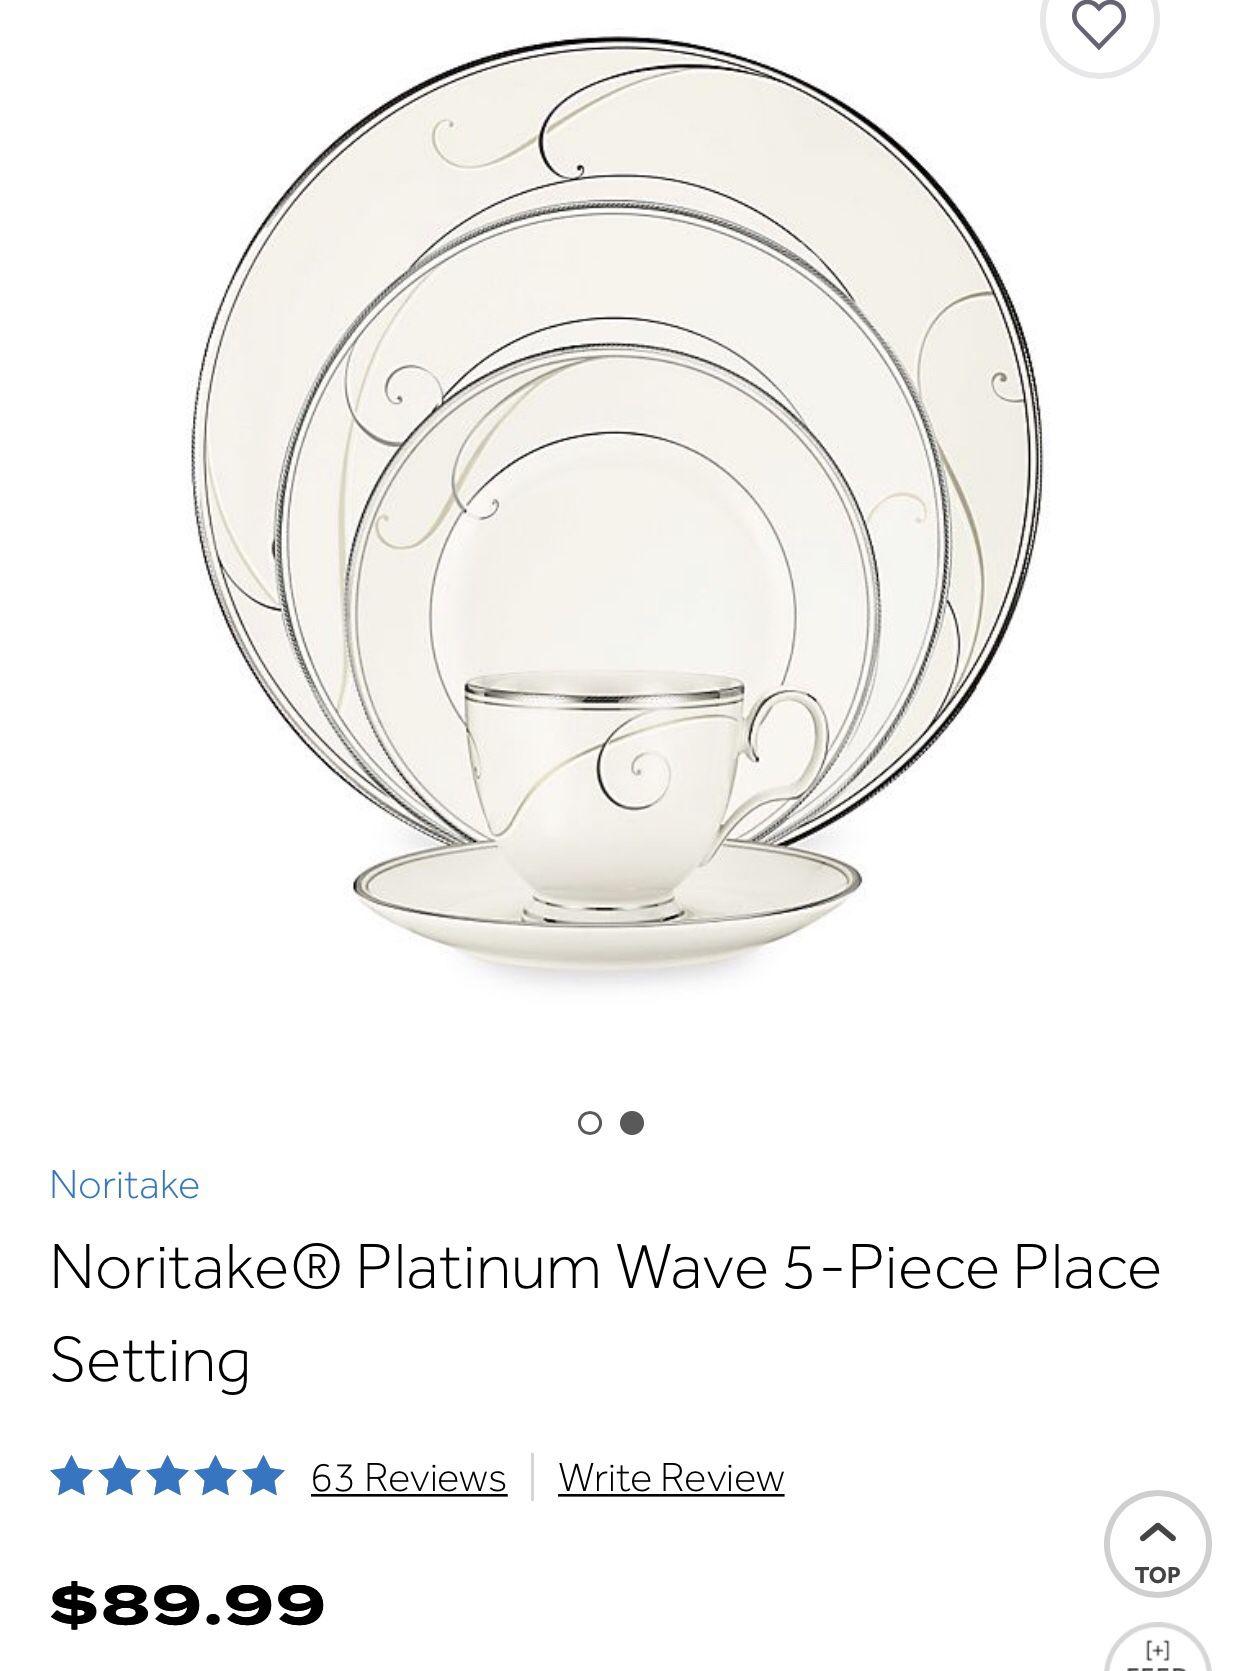 3 place settings Noritake Platinum Wave